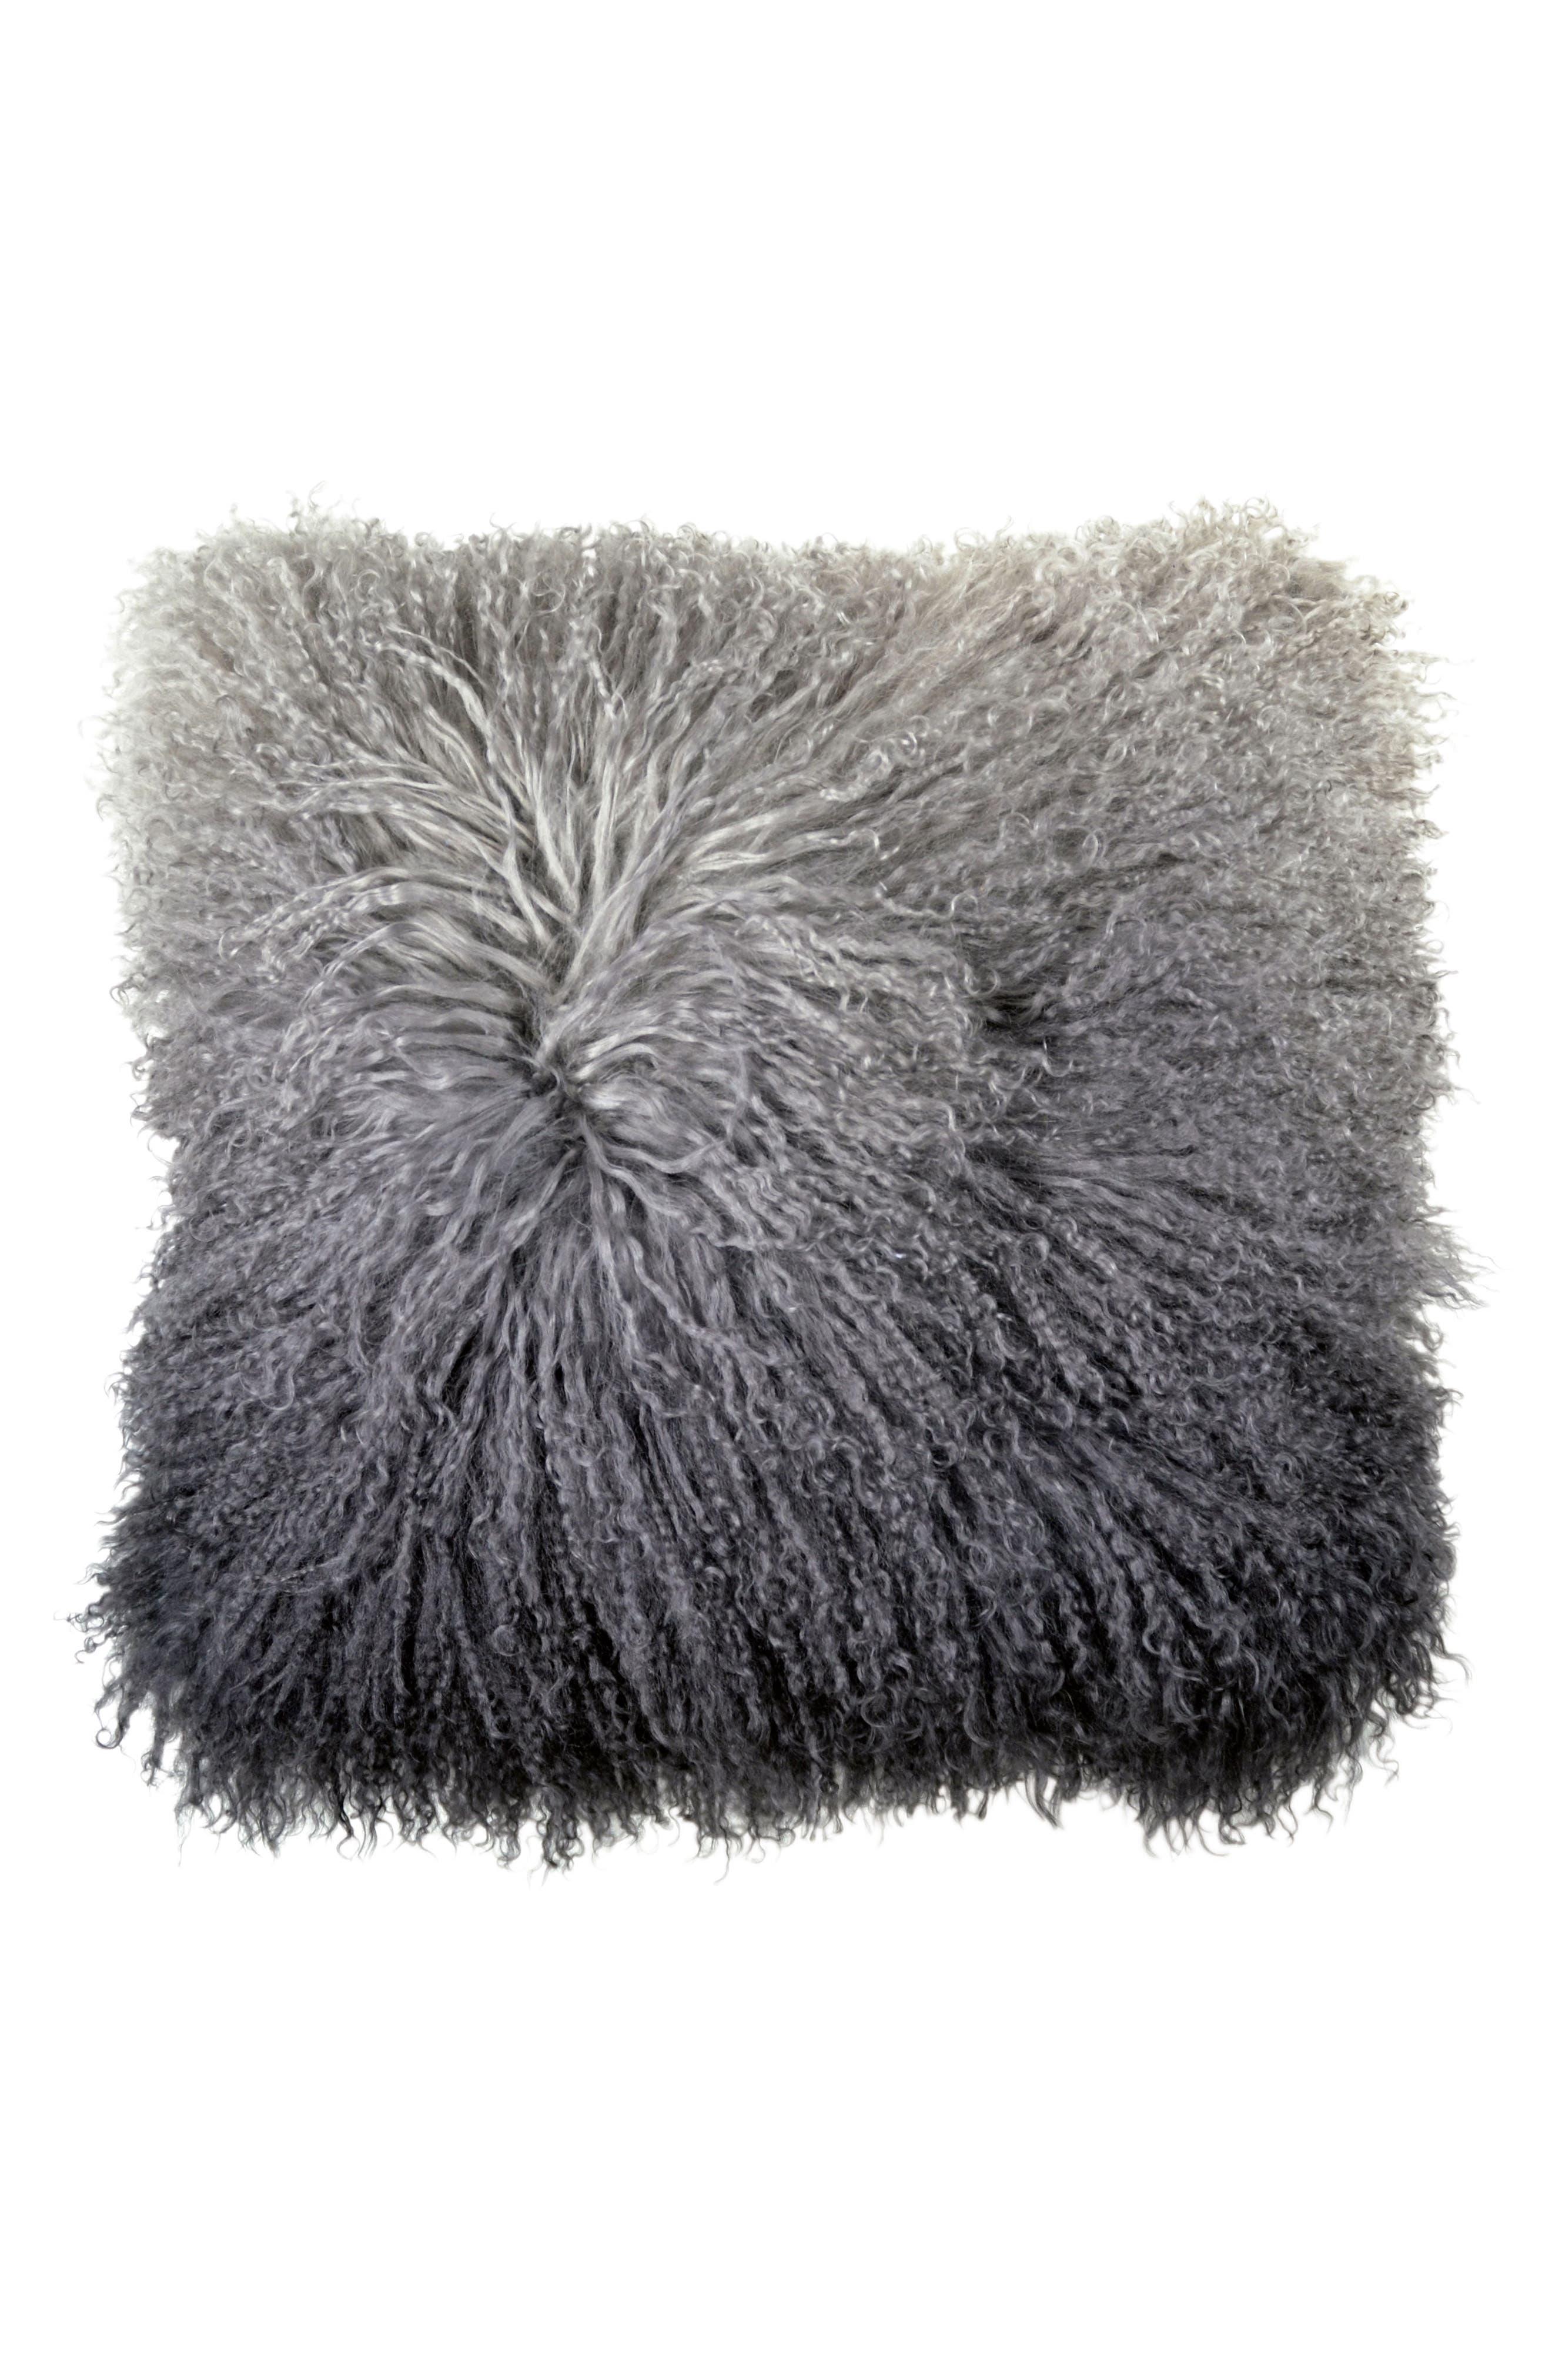 Dip Dye Sheepskin Accent Pillow,                             Main thumbnail 1, color,                             CHARCOAL